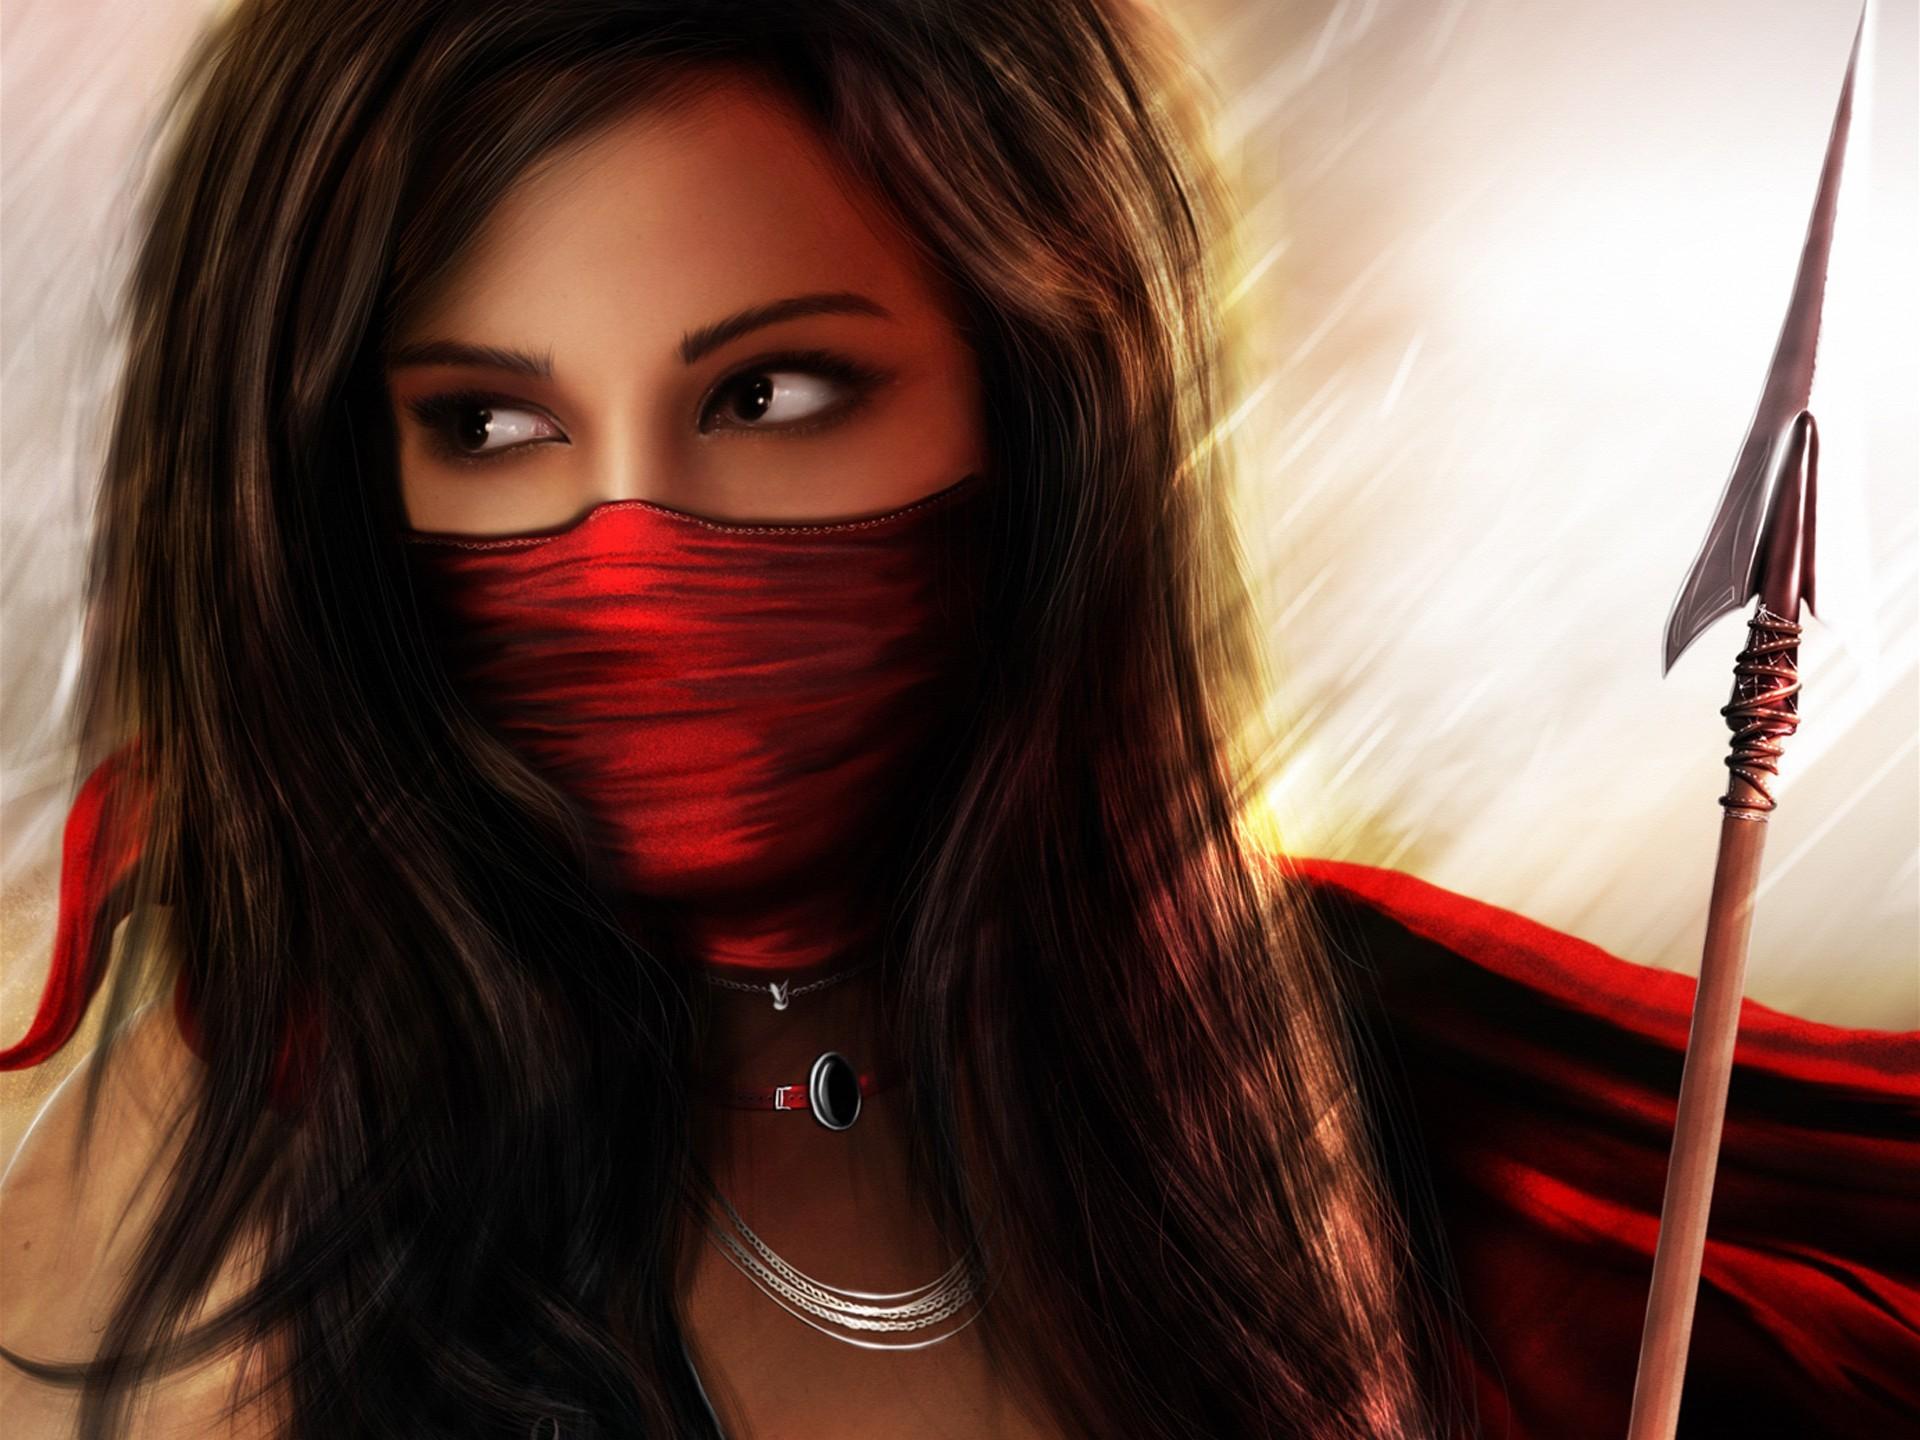 wall papers, female | Female Warrior Desktop Wallpaper. Fantasy …